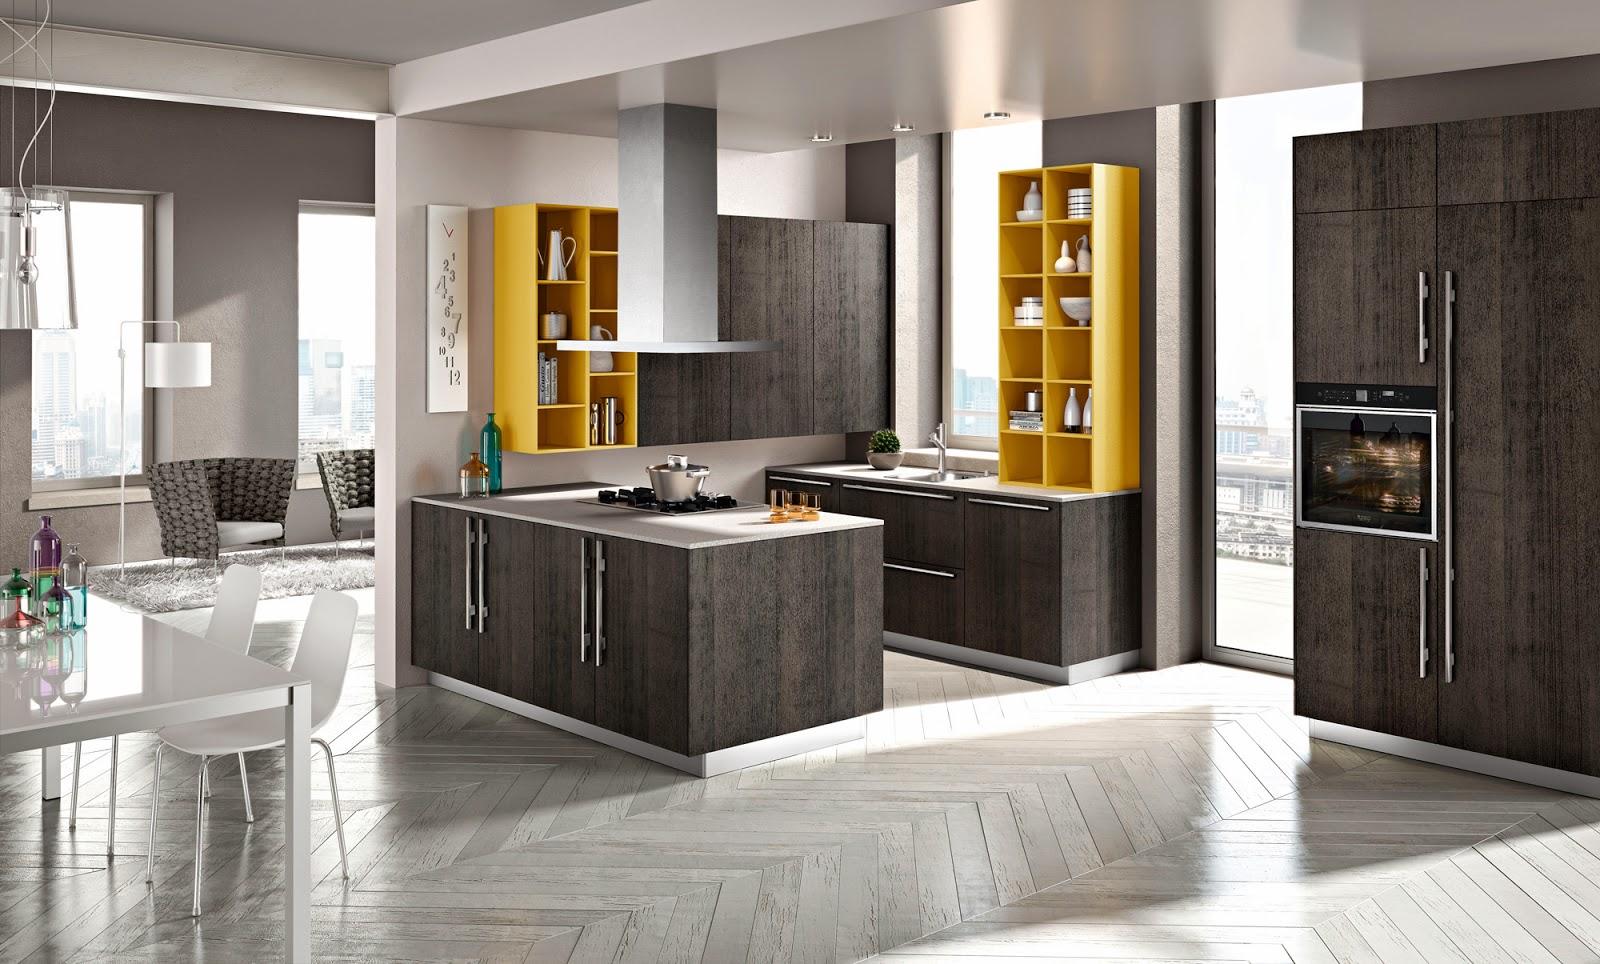 Cucine moderne le migliori soluzioni per arredare la tua cucina - Le migliori cucine moderne ...